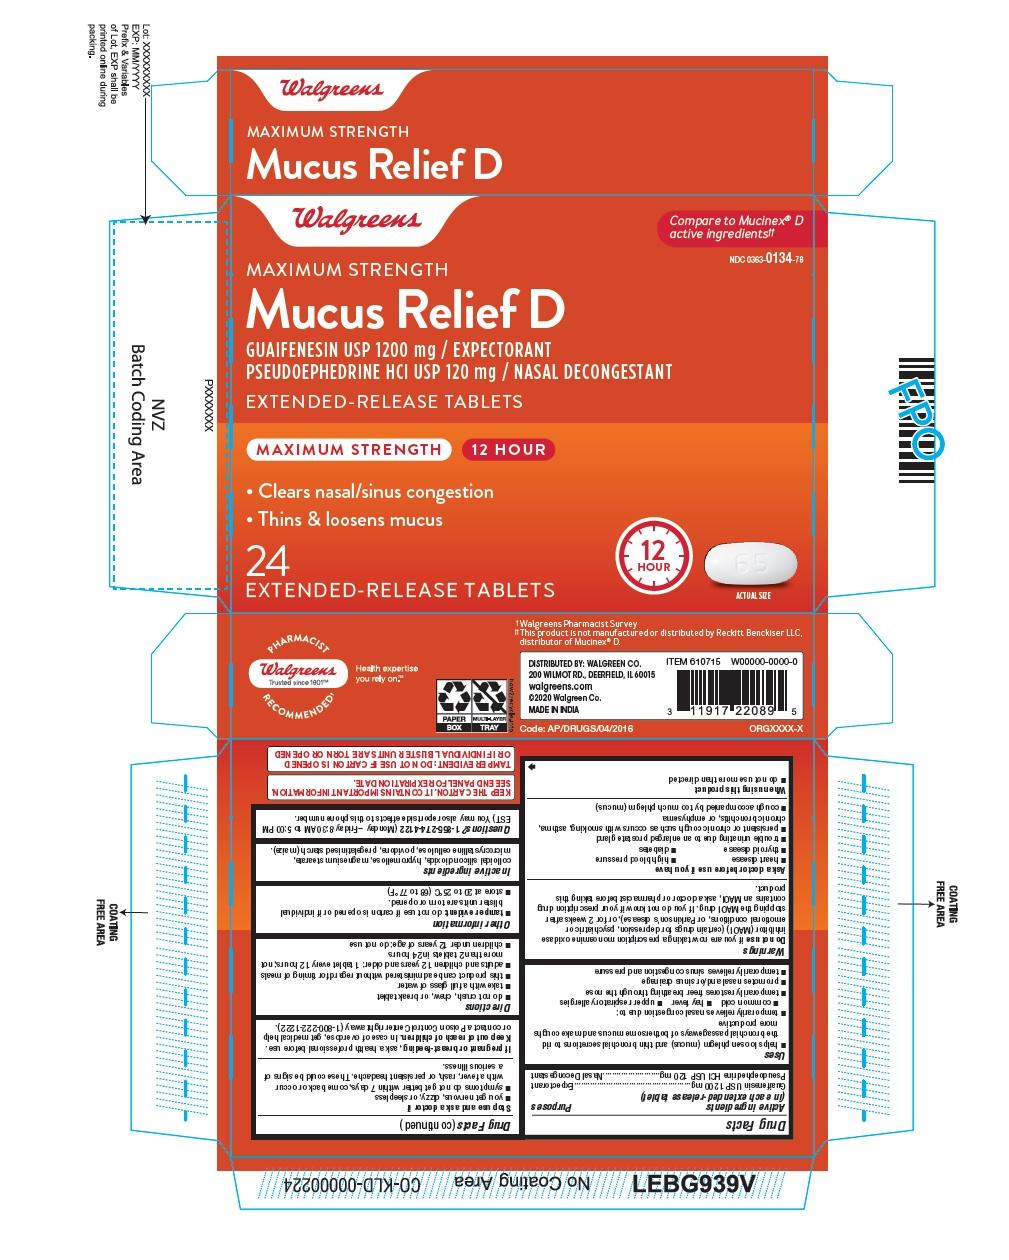 PACKAGE LABEL-PRINCIPAL DISPLAY PANEL - 600 mg/60 mg (18 Tablet Carton Label)